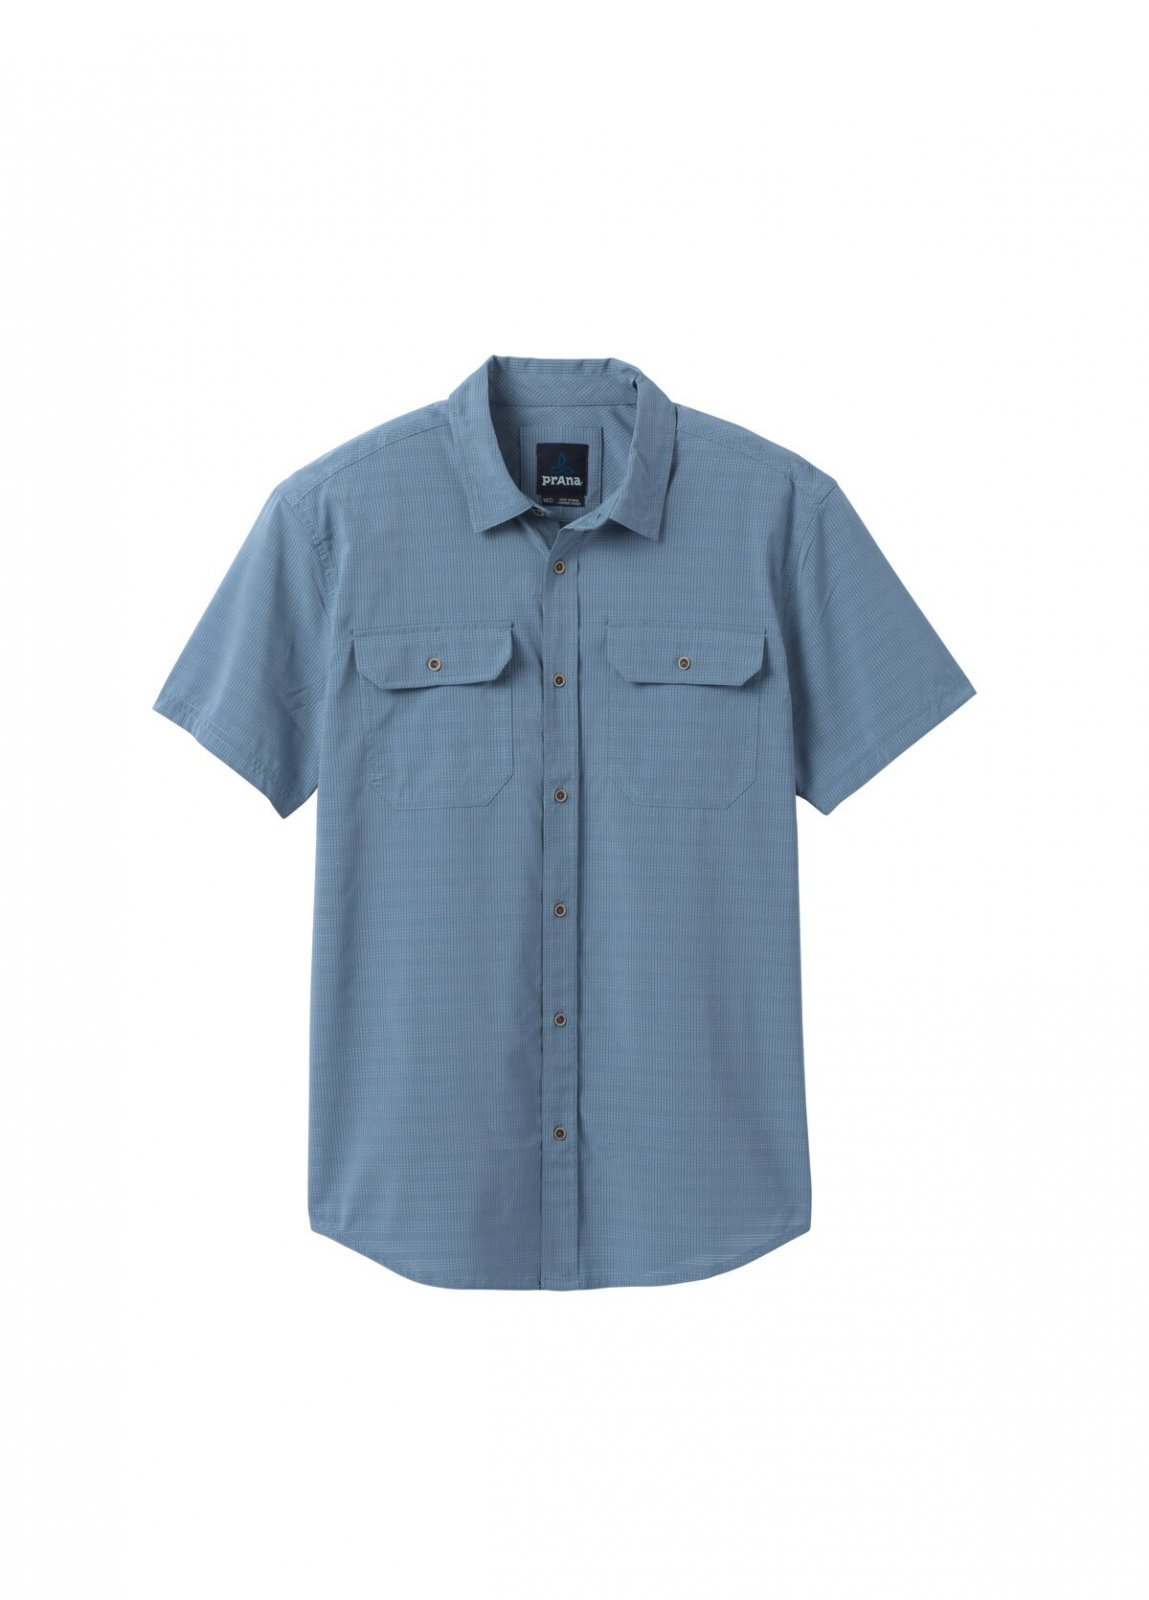 PrAna Men's Cayman Shirt in Blue Note